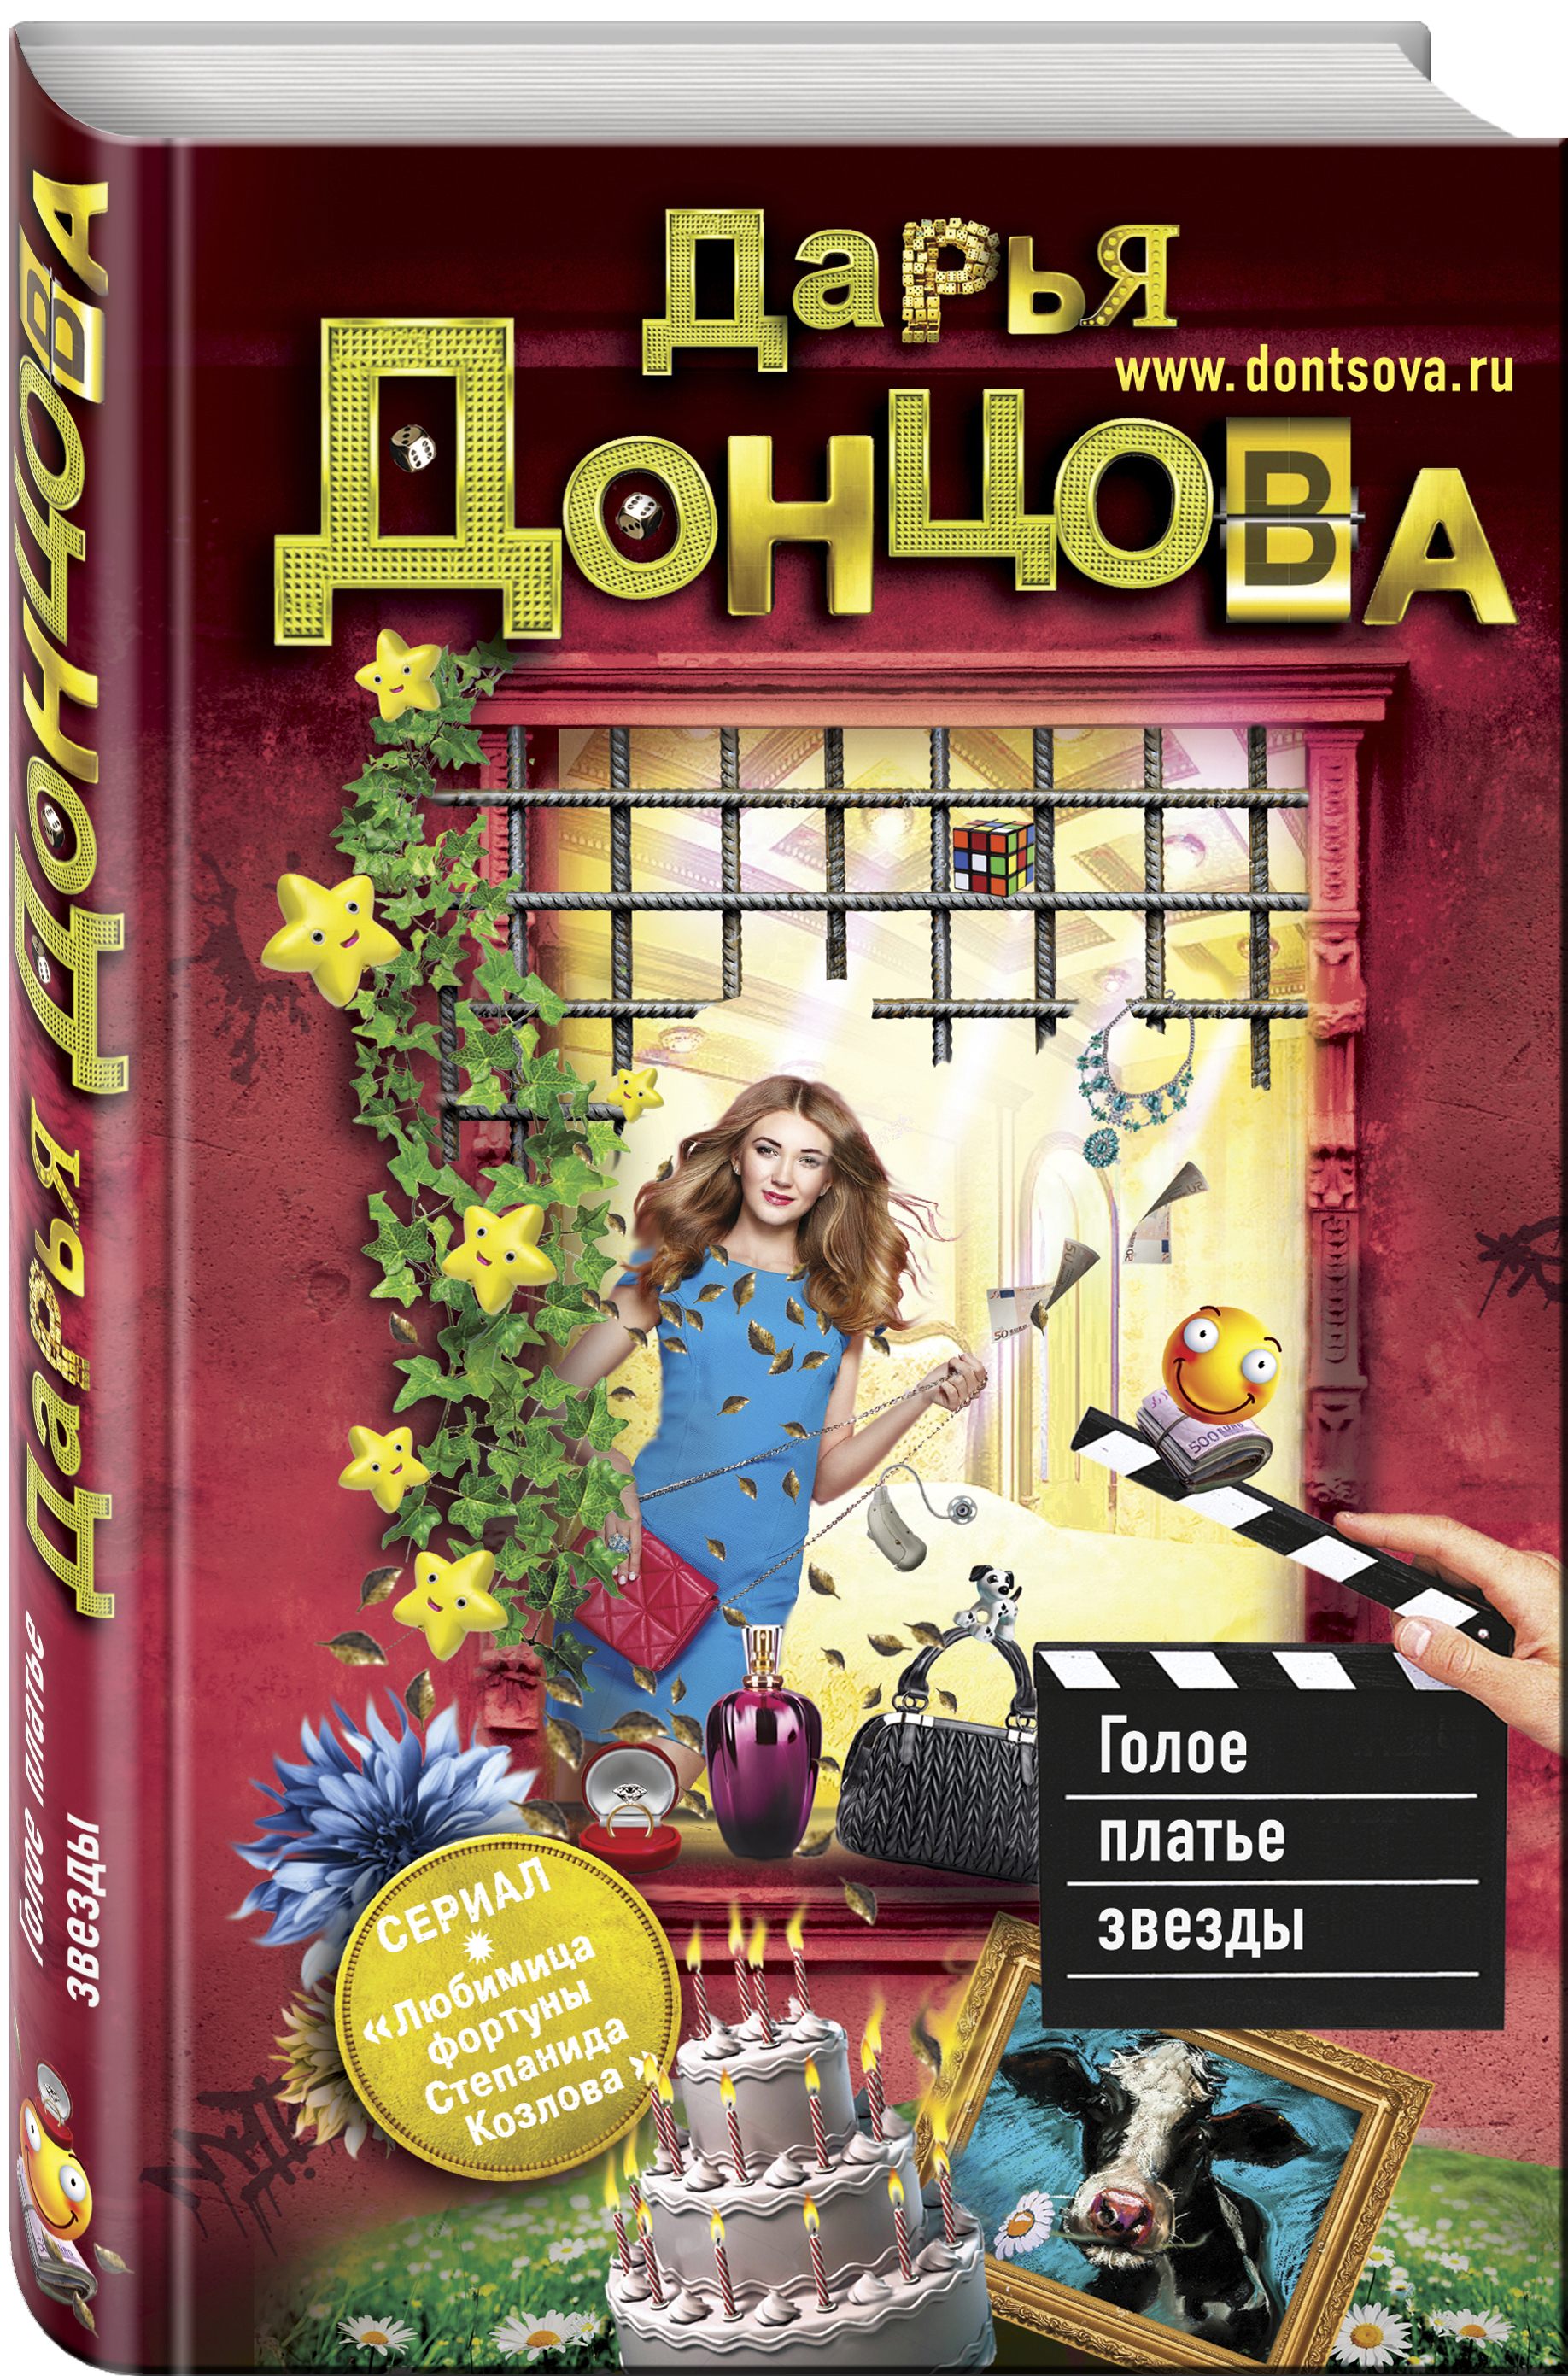 Донцова Дарья Аркадьевна Голое платье звезды